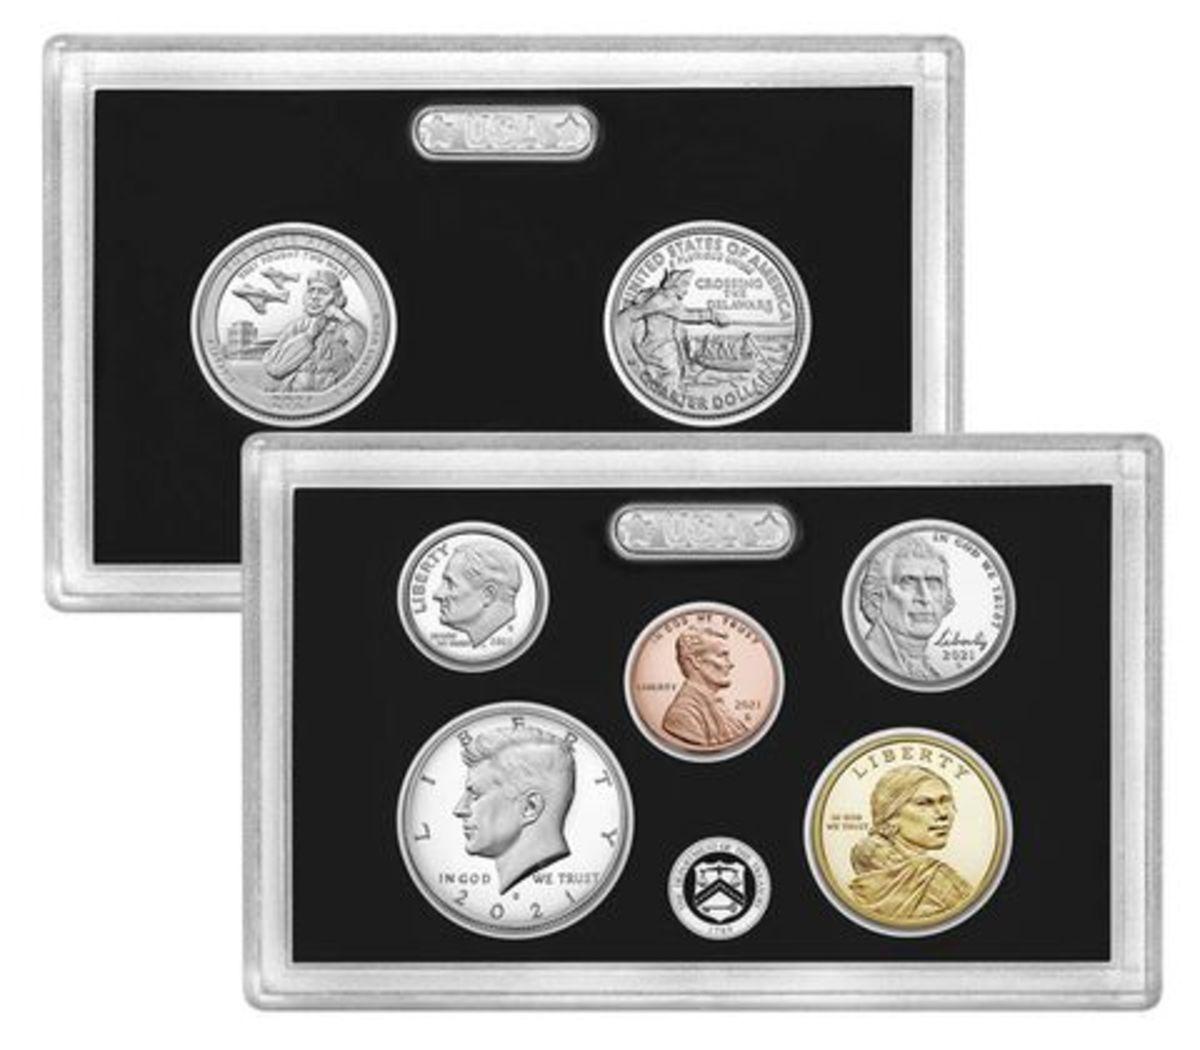 2021 silver proof set. (Image courtesy U.S. Mint.)